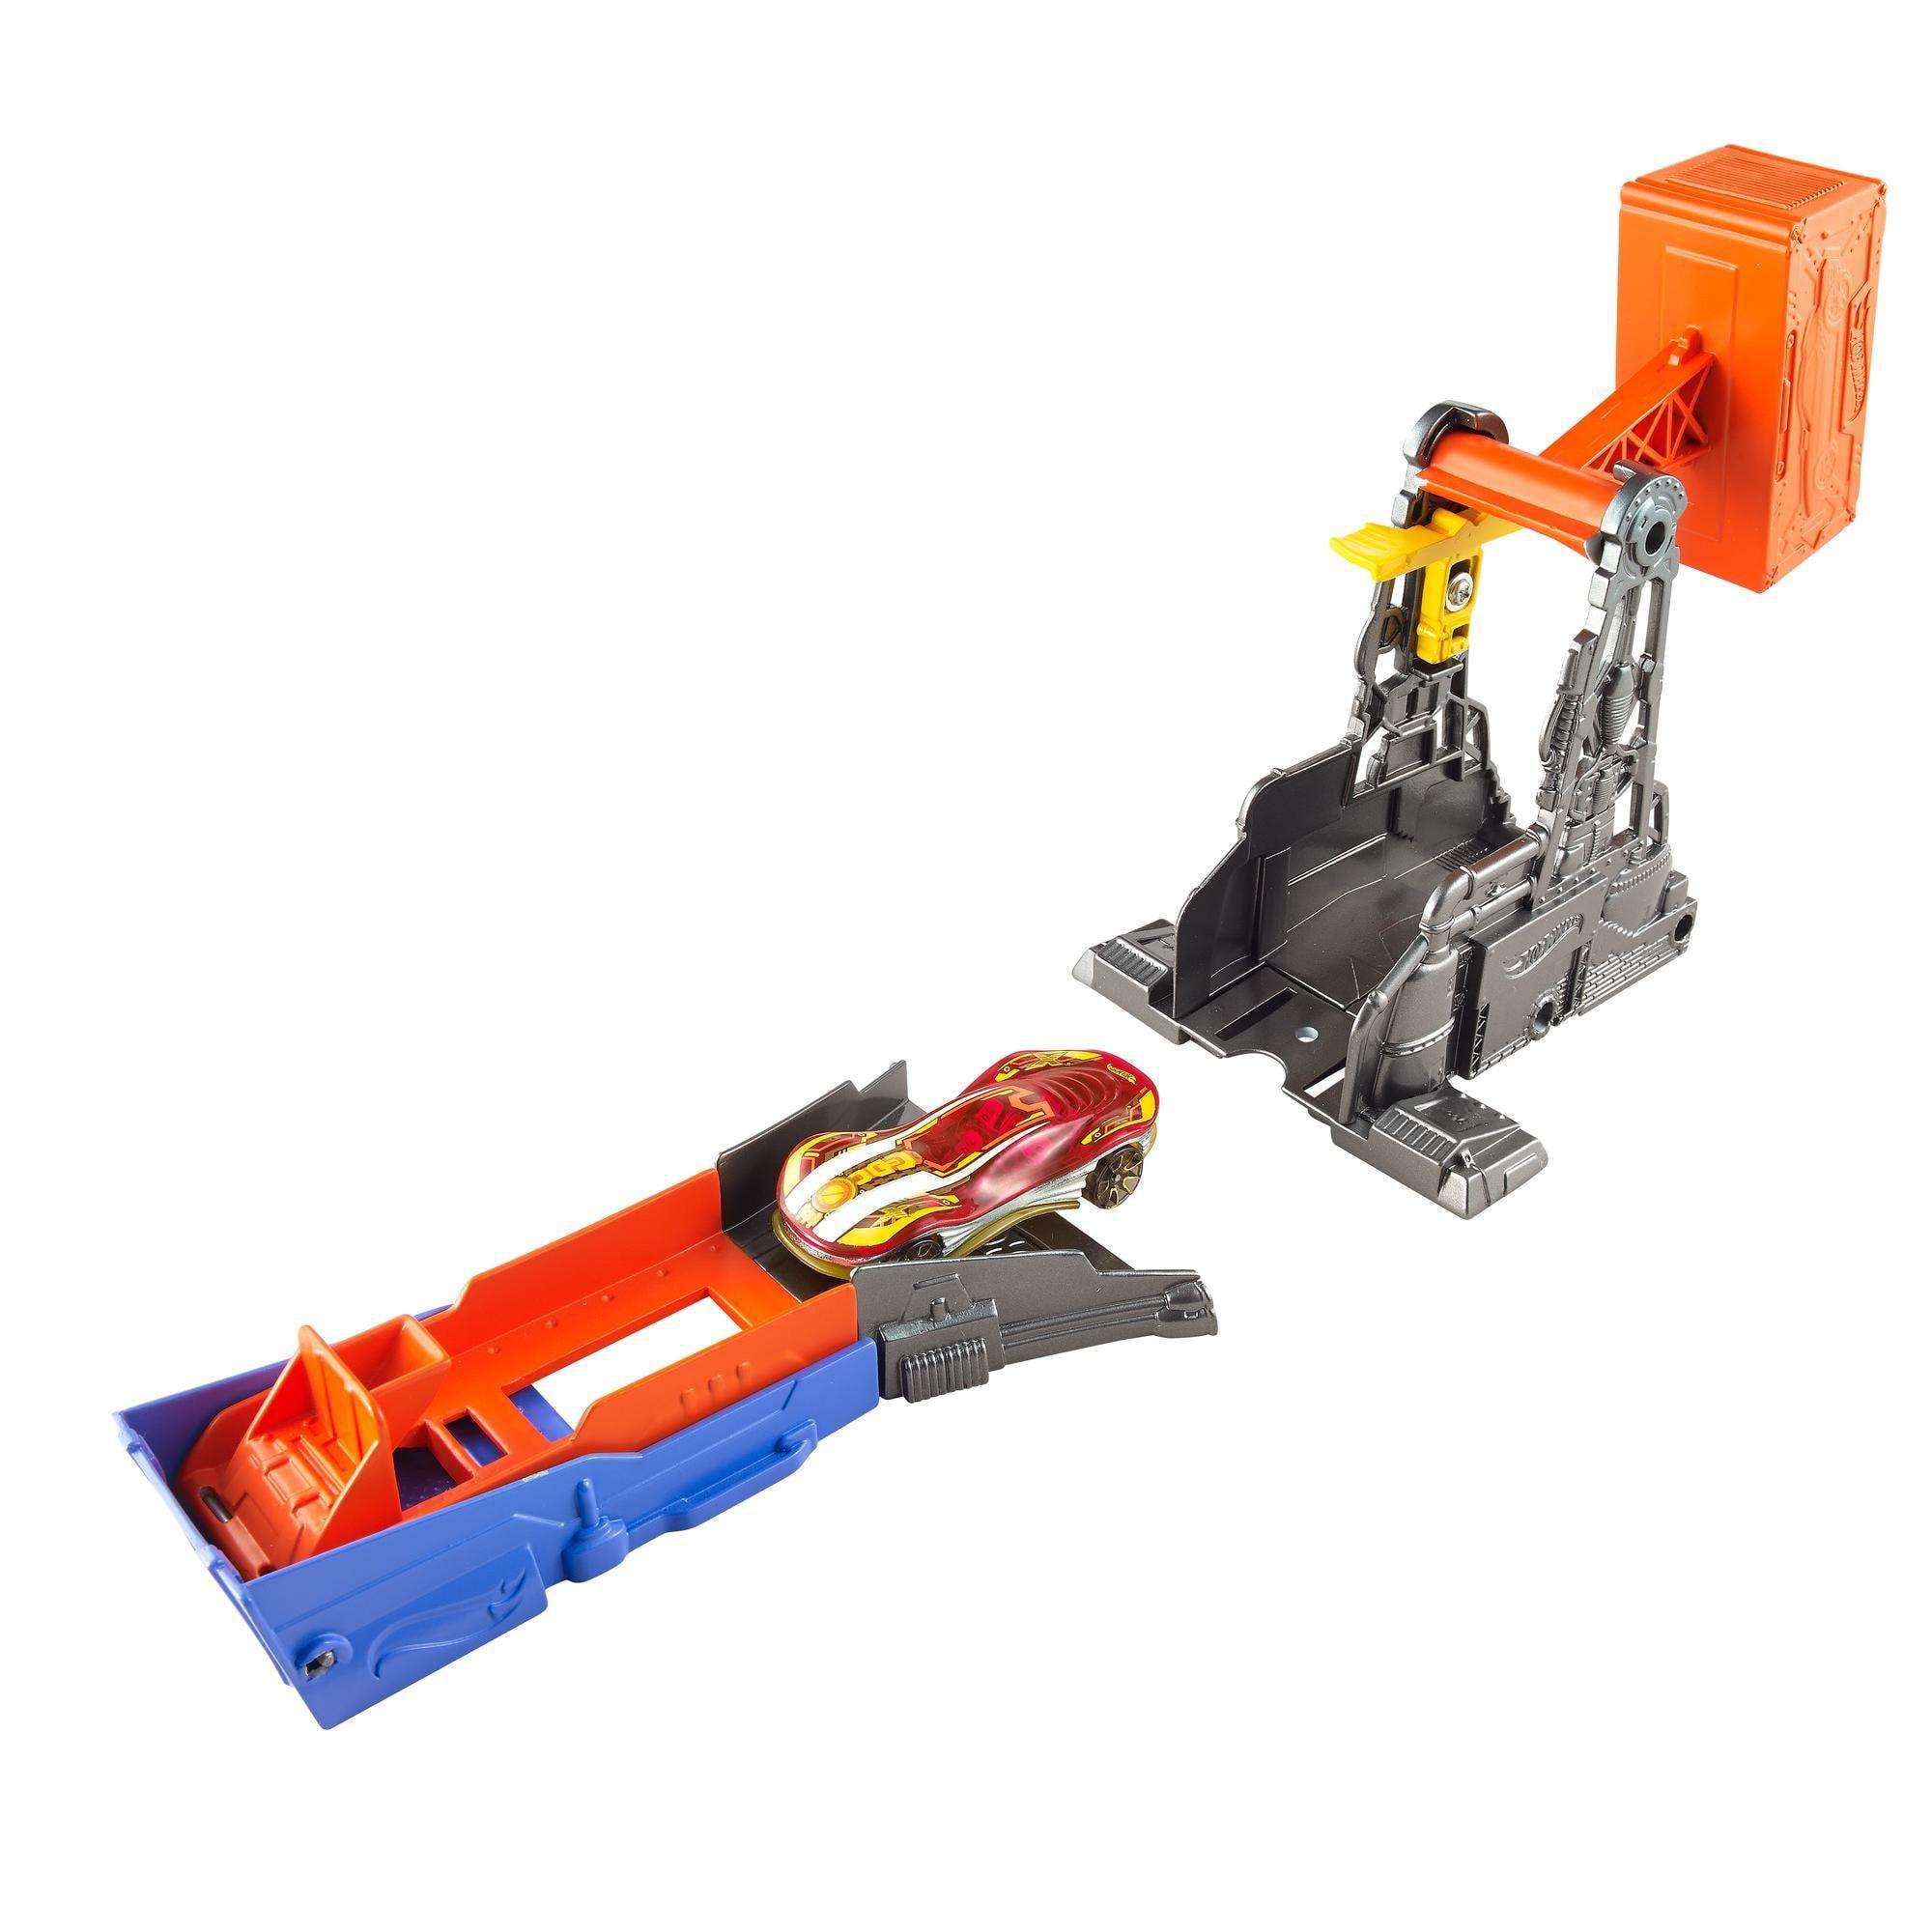 Hot Wheels Hammer Blast Track Set by Mattel Toys